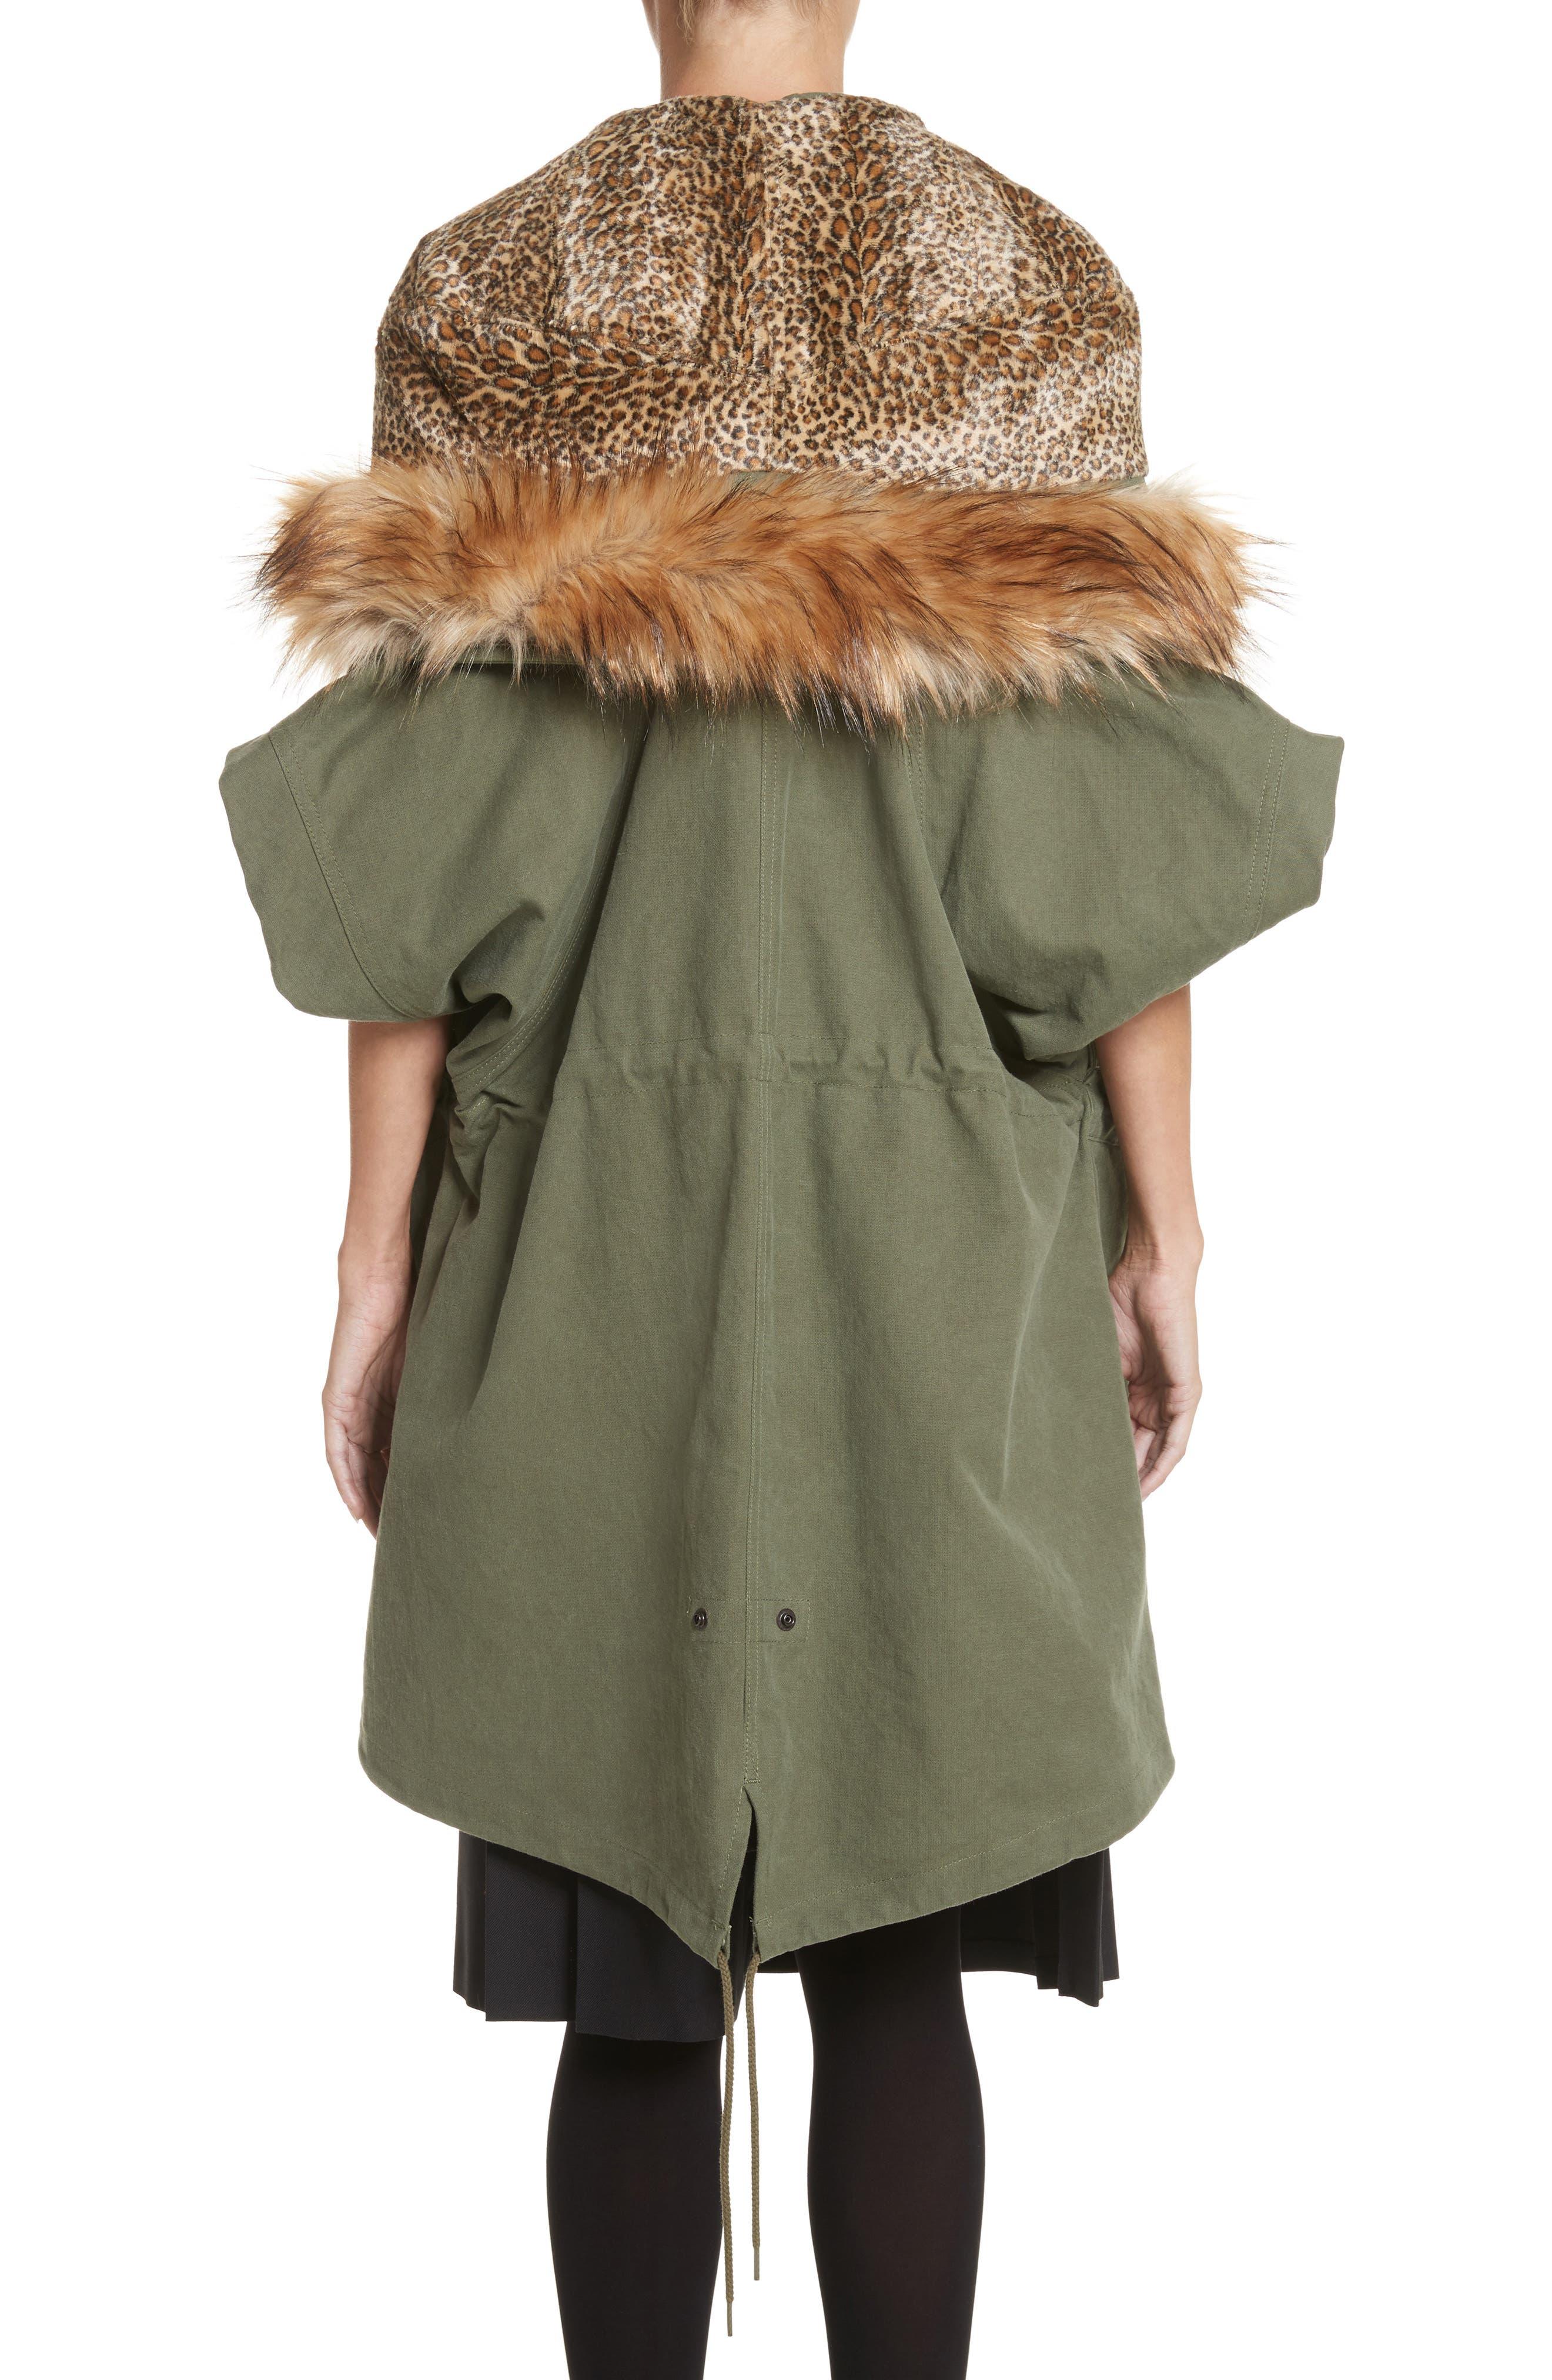 Army Coat with Cheetah Faux Fur Hood,                             Alternate thumbnail 2, color,                             340